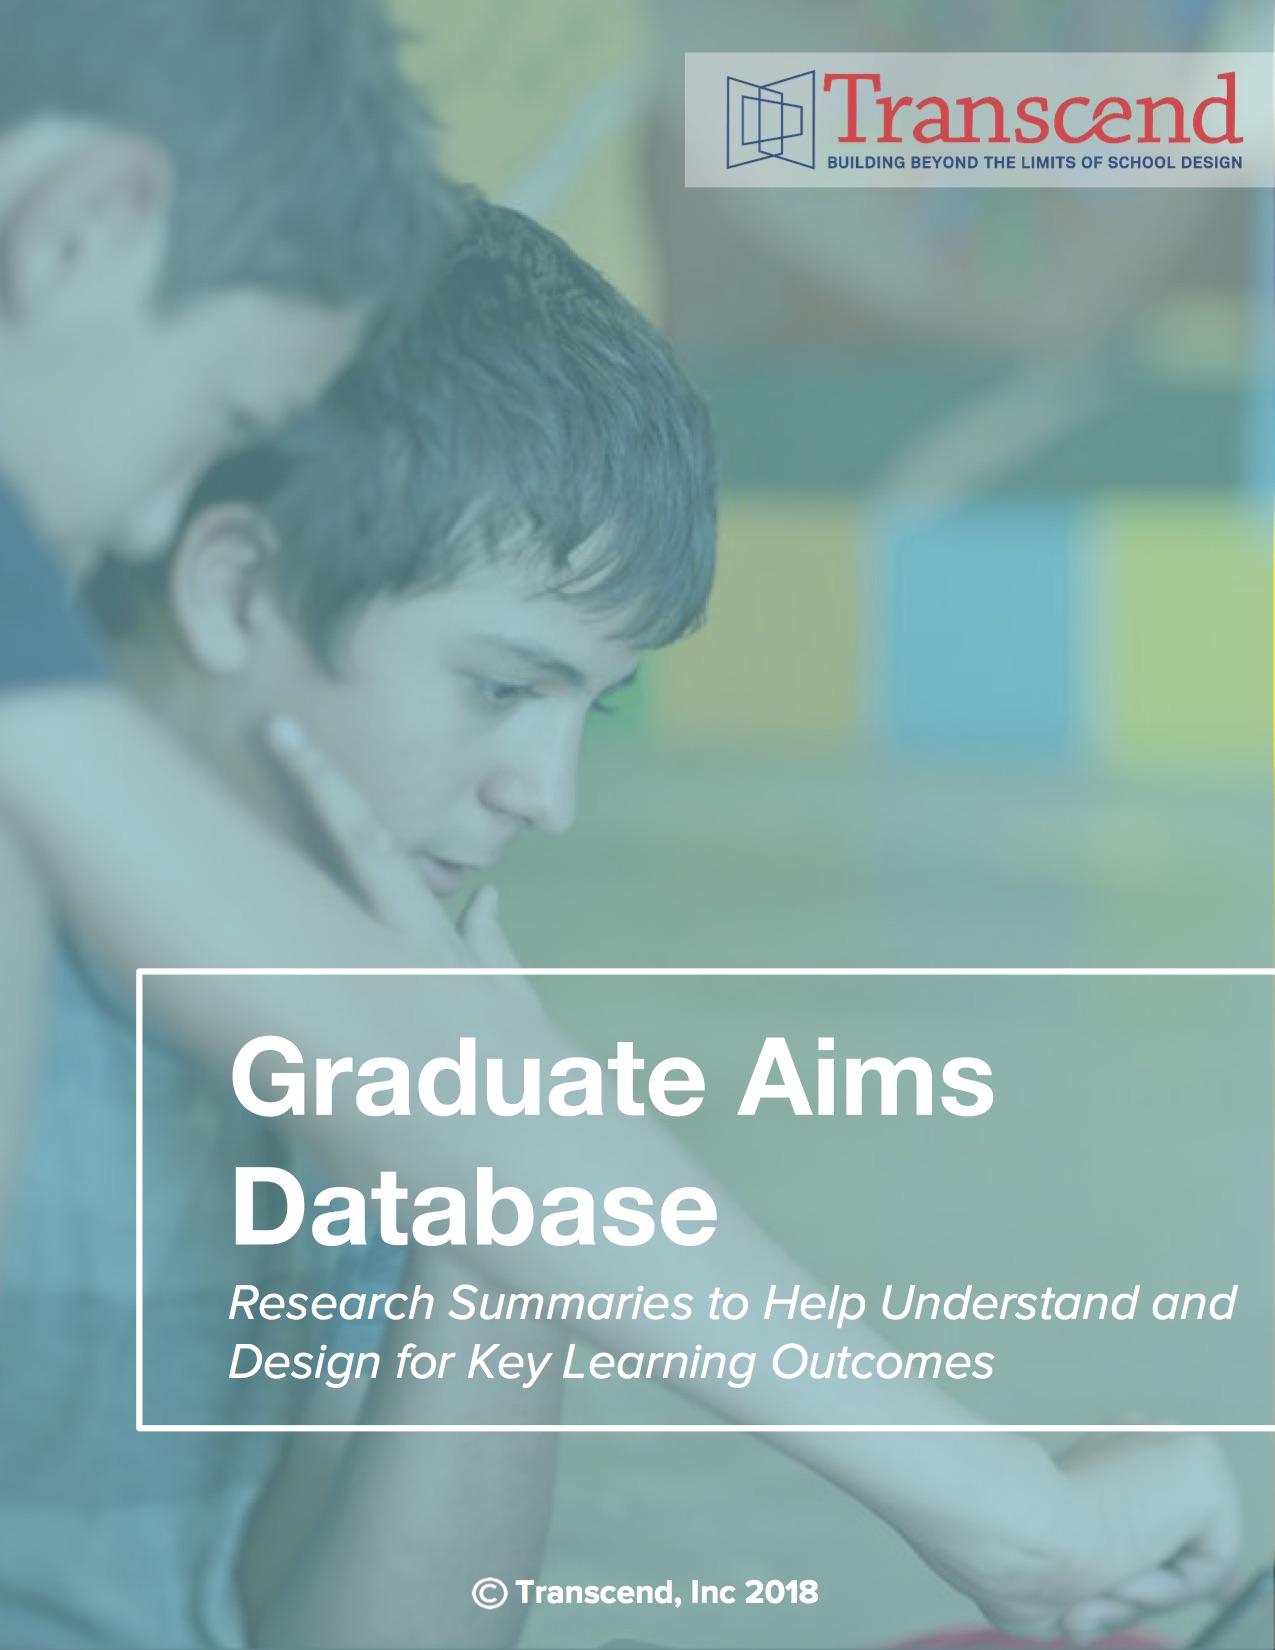 Graduate Aims Database Cover.jpg